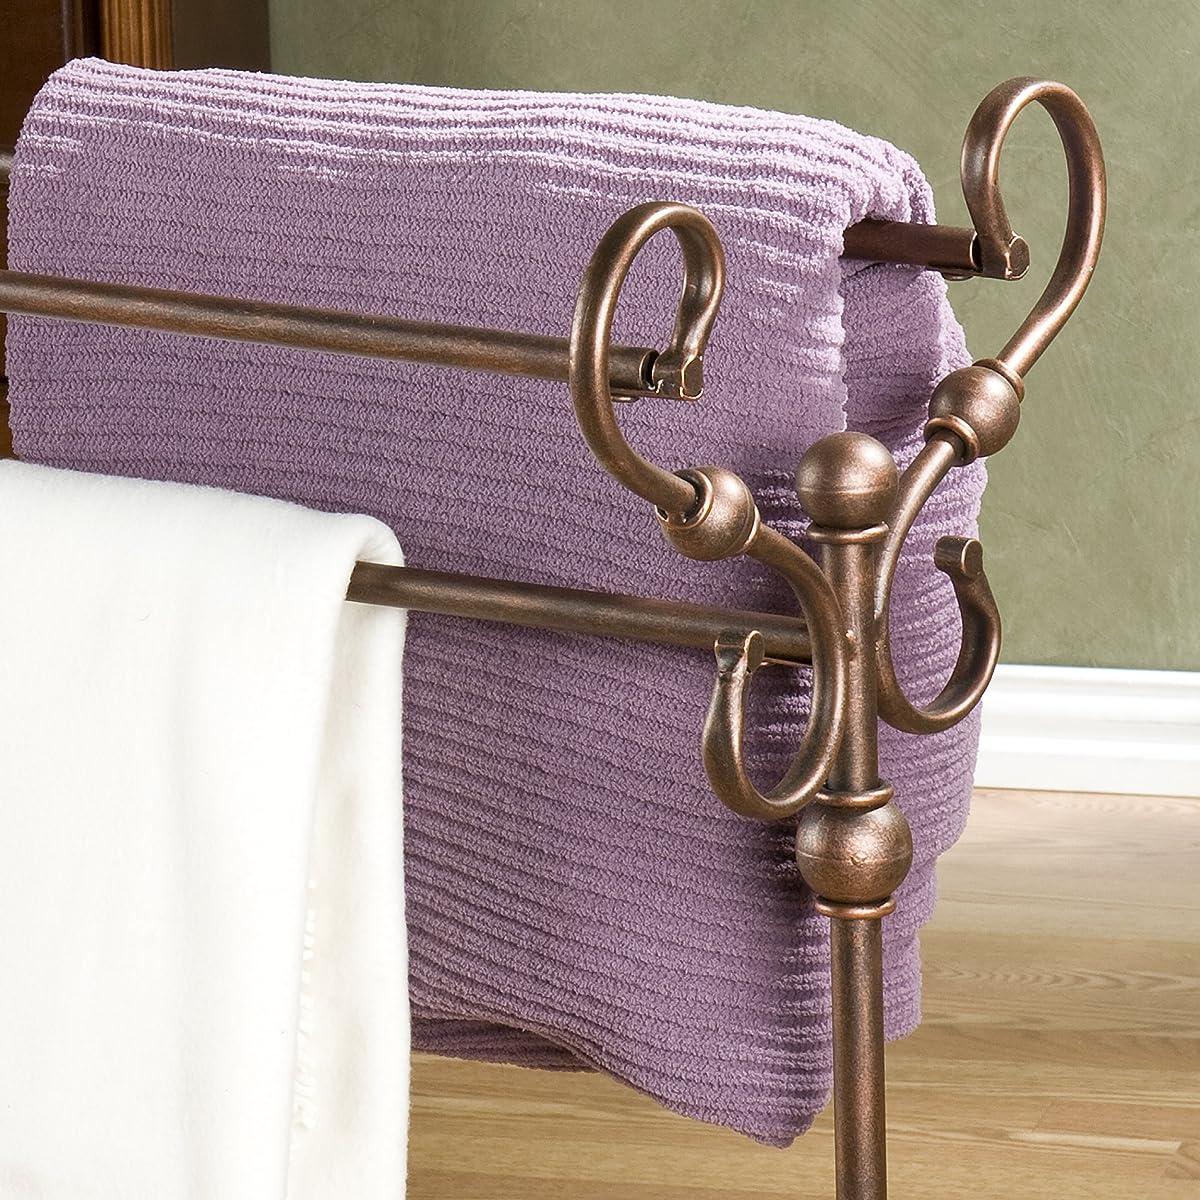 Lourdes Blanket Rack